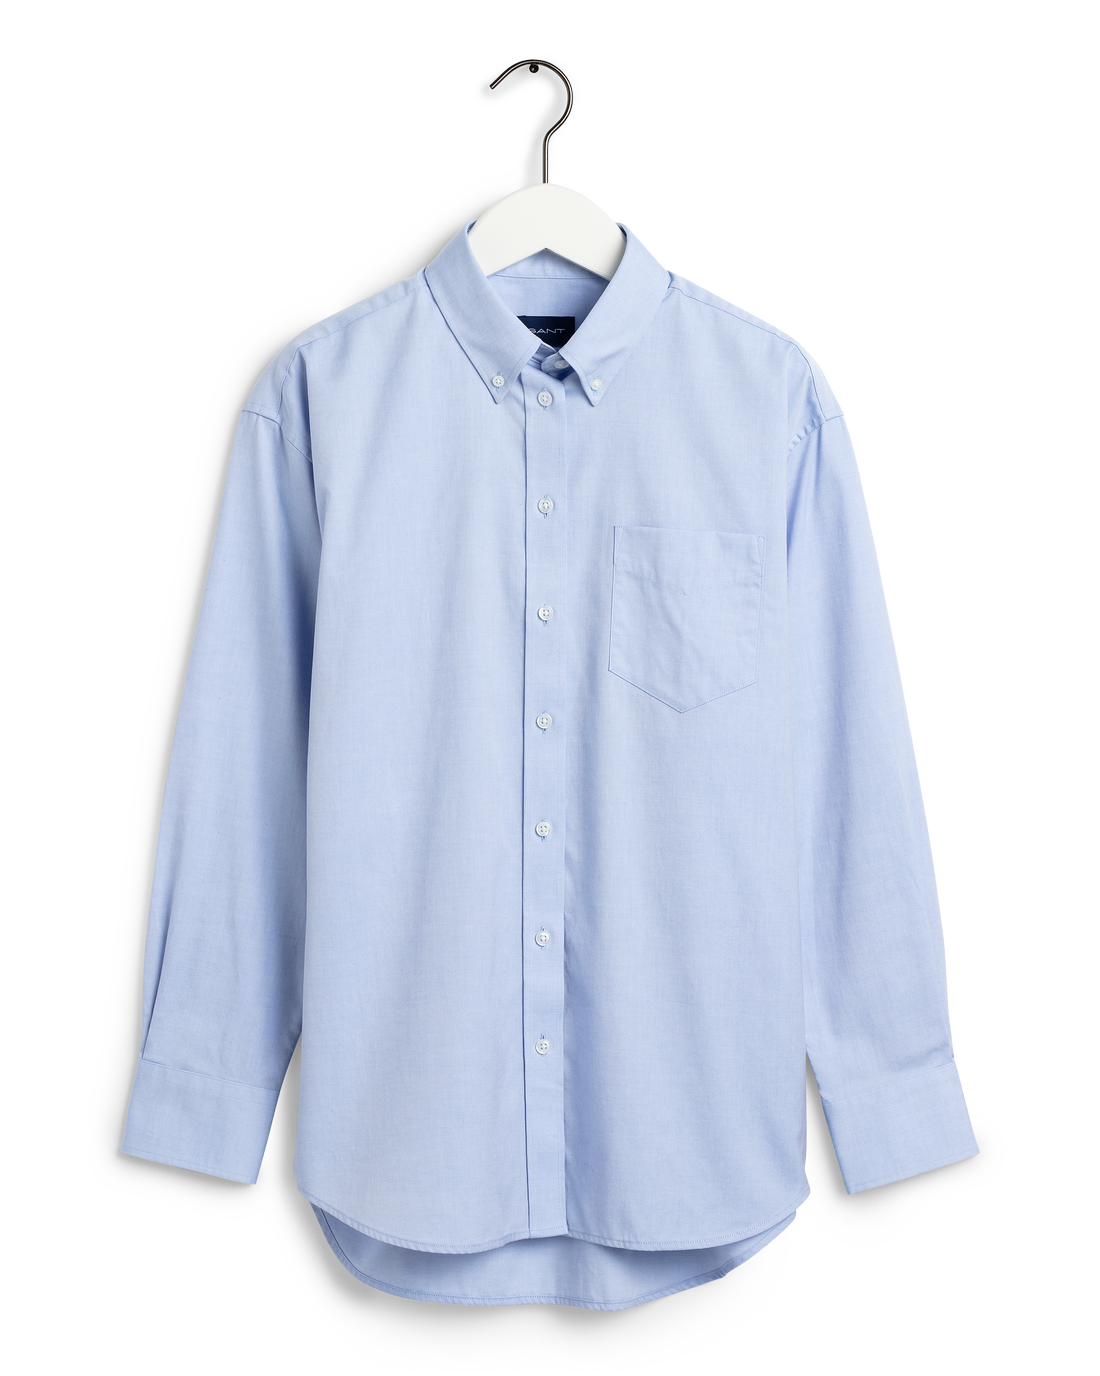 Ljusblå skjorta med button down-krage, 999 kronor, Gant.